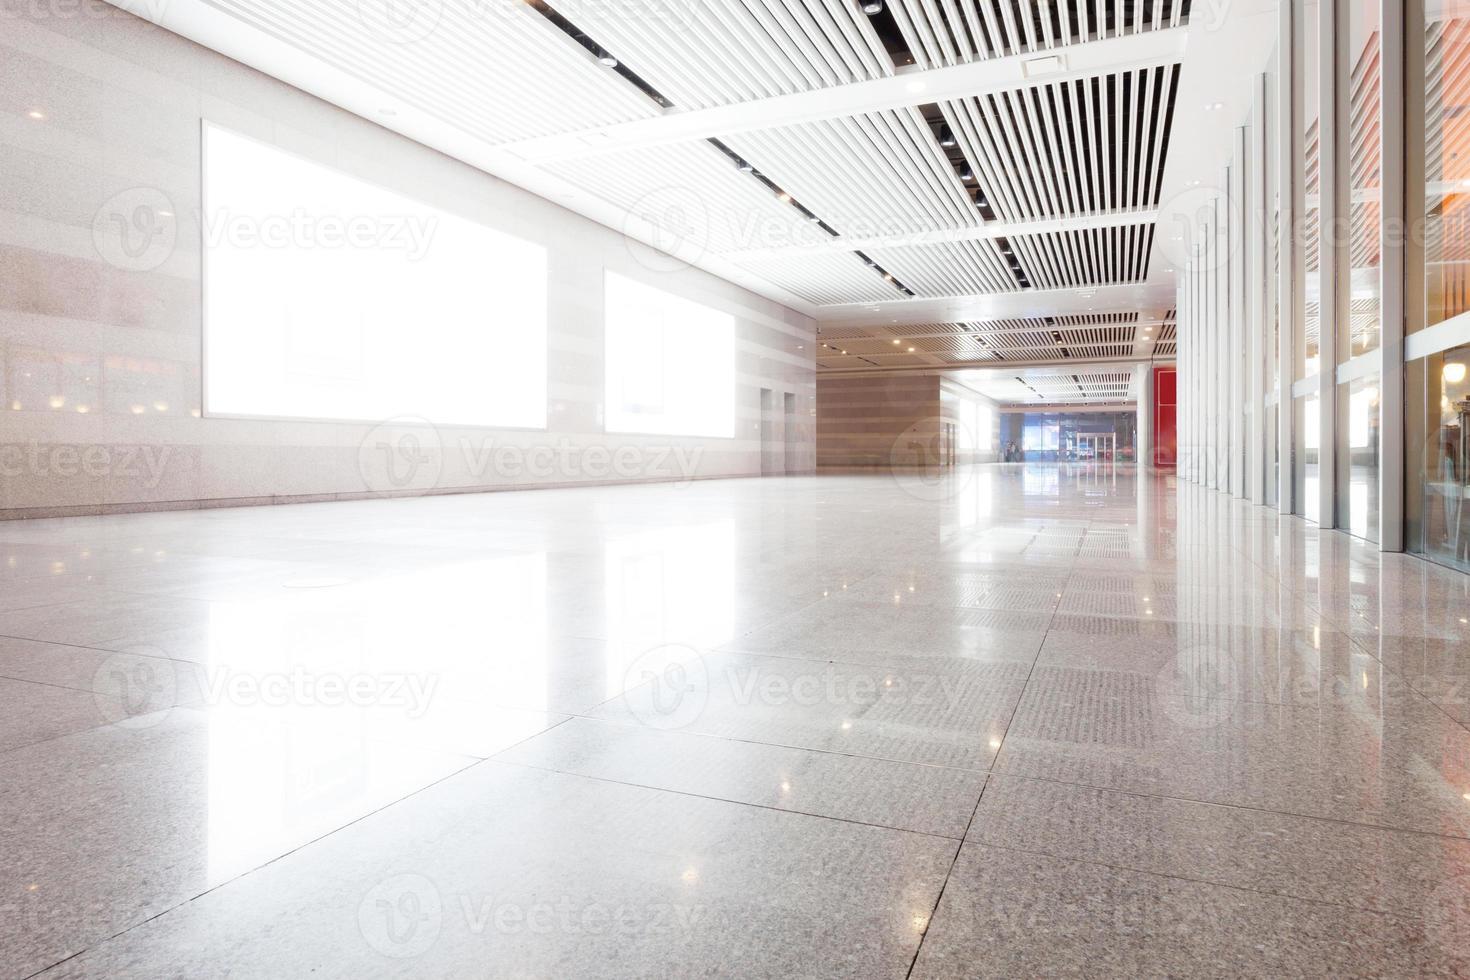 corredor longo vazio no moderno edifício de escritórios com outdoor foto